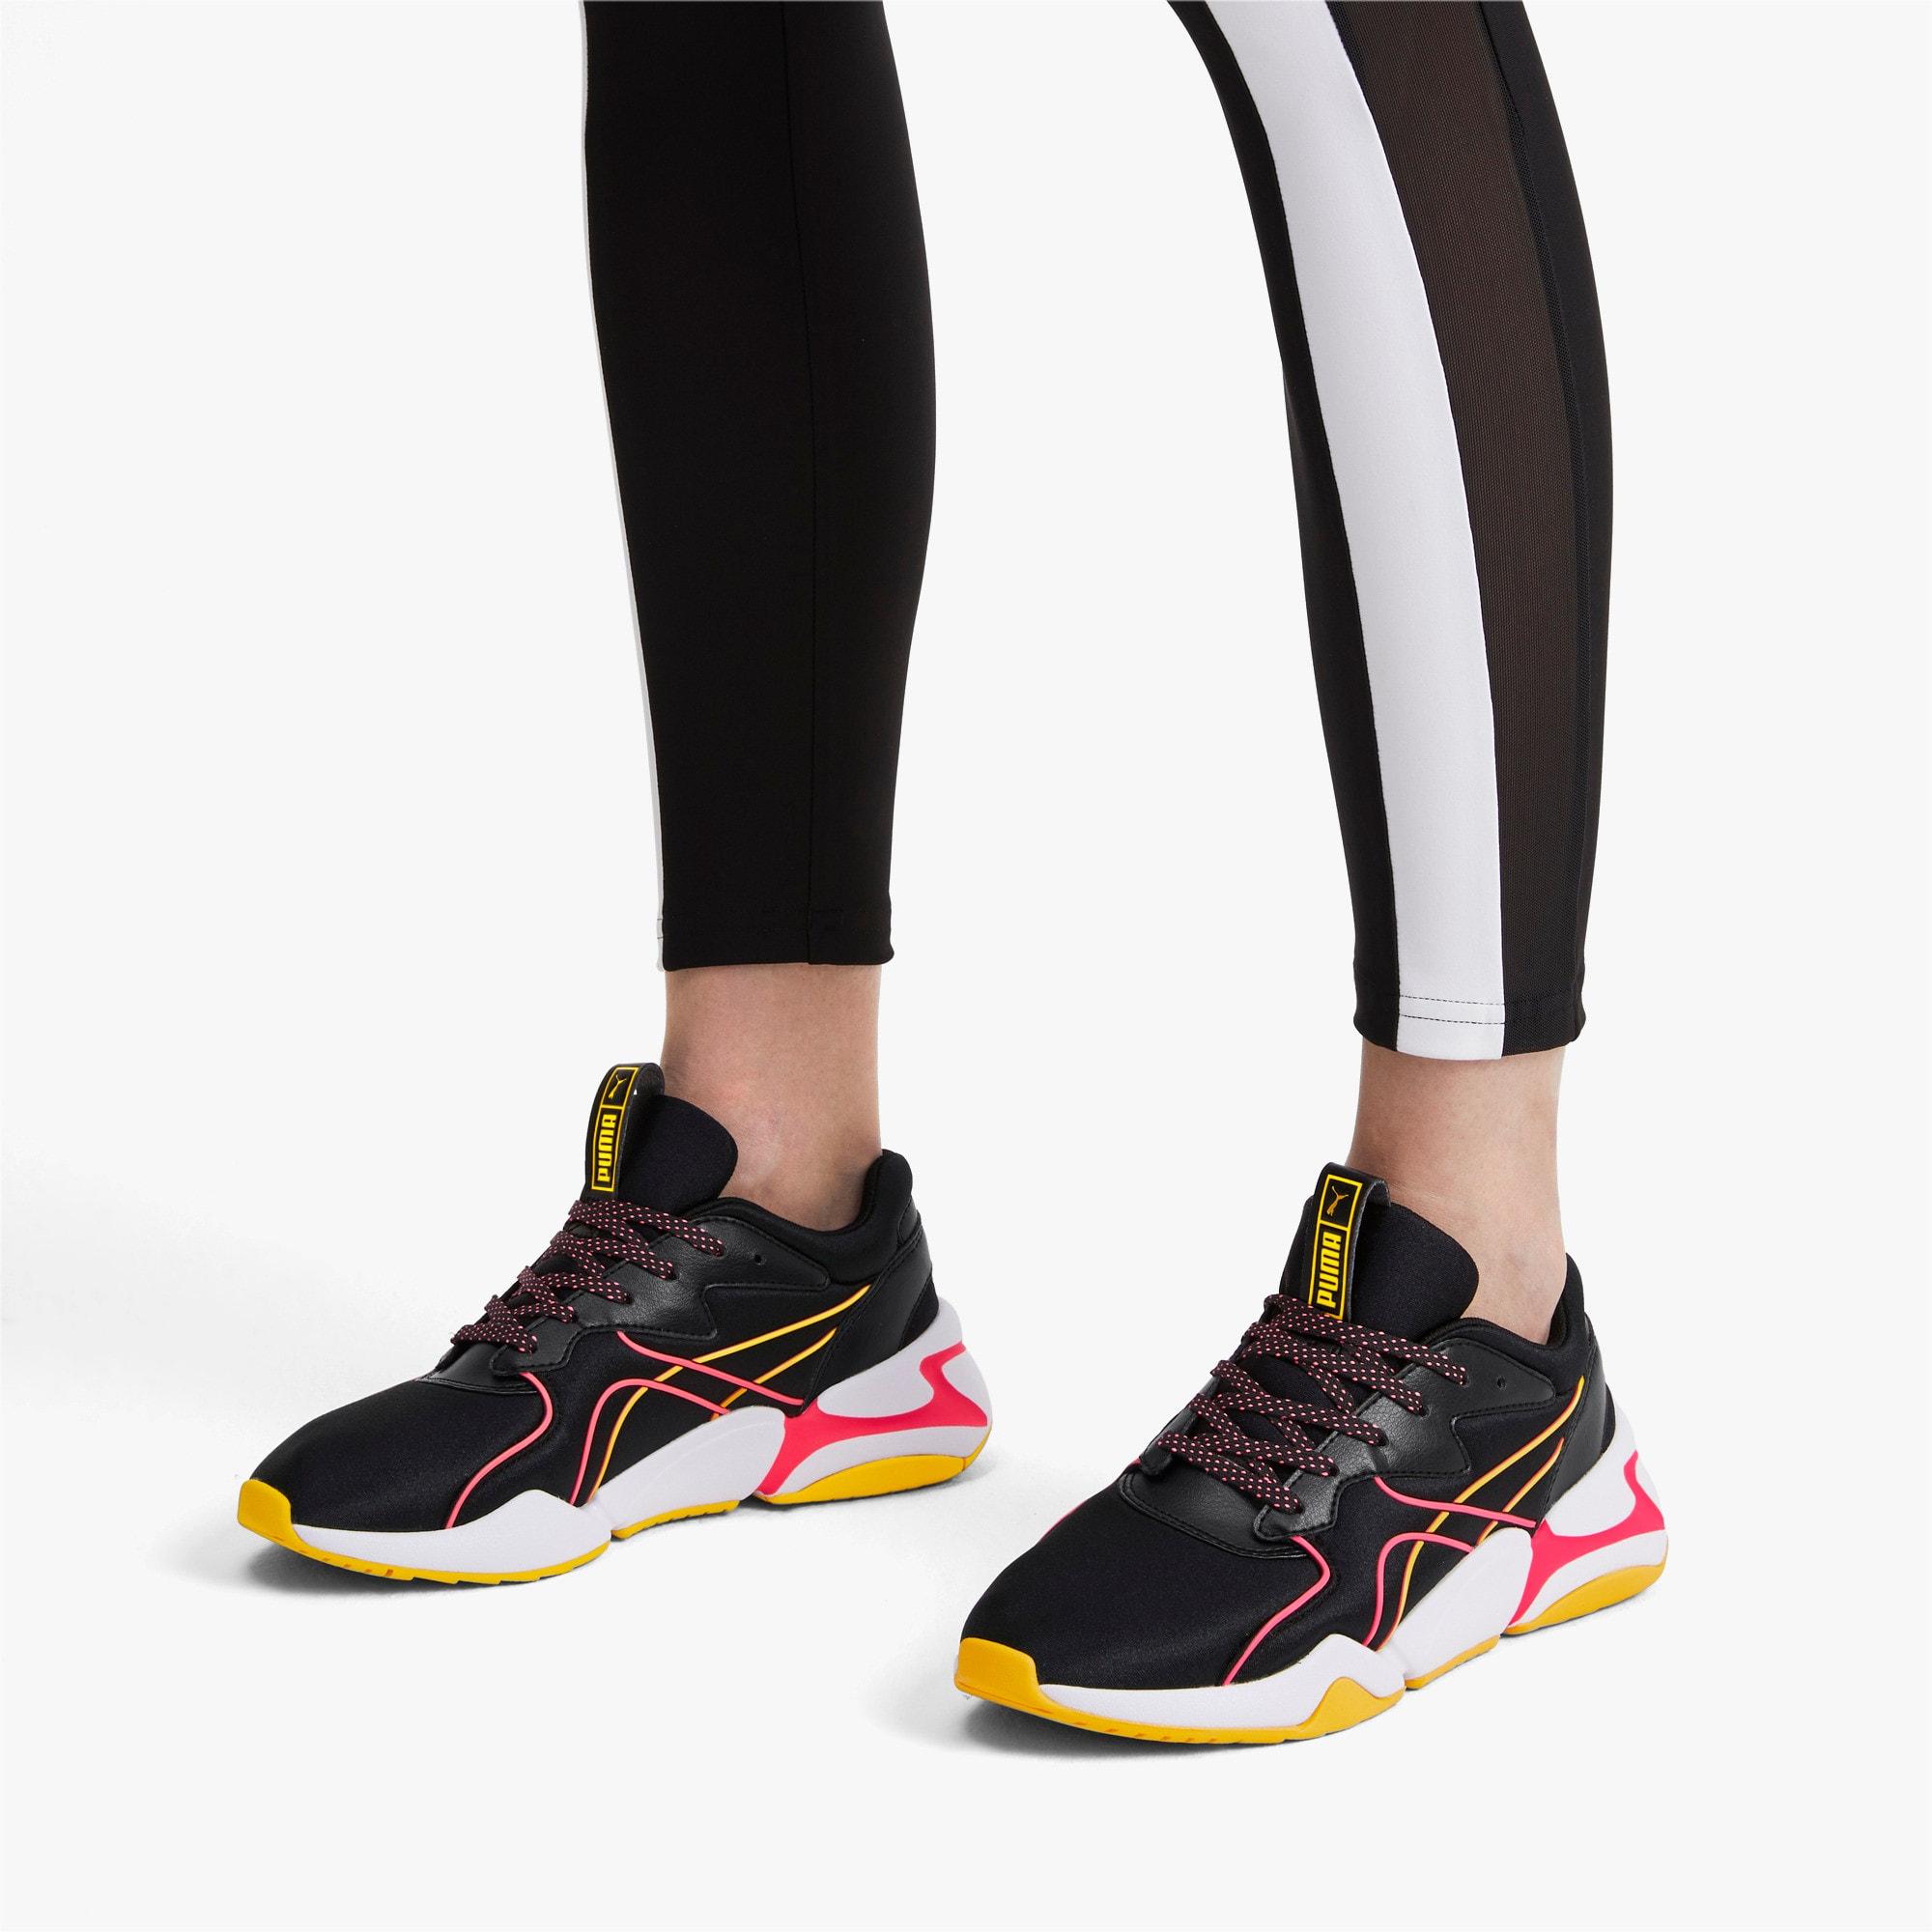 Thumbnail 2 of Nova Hypertech Women's Sneakers, Puma Black, medium